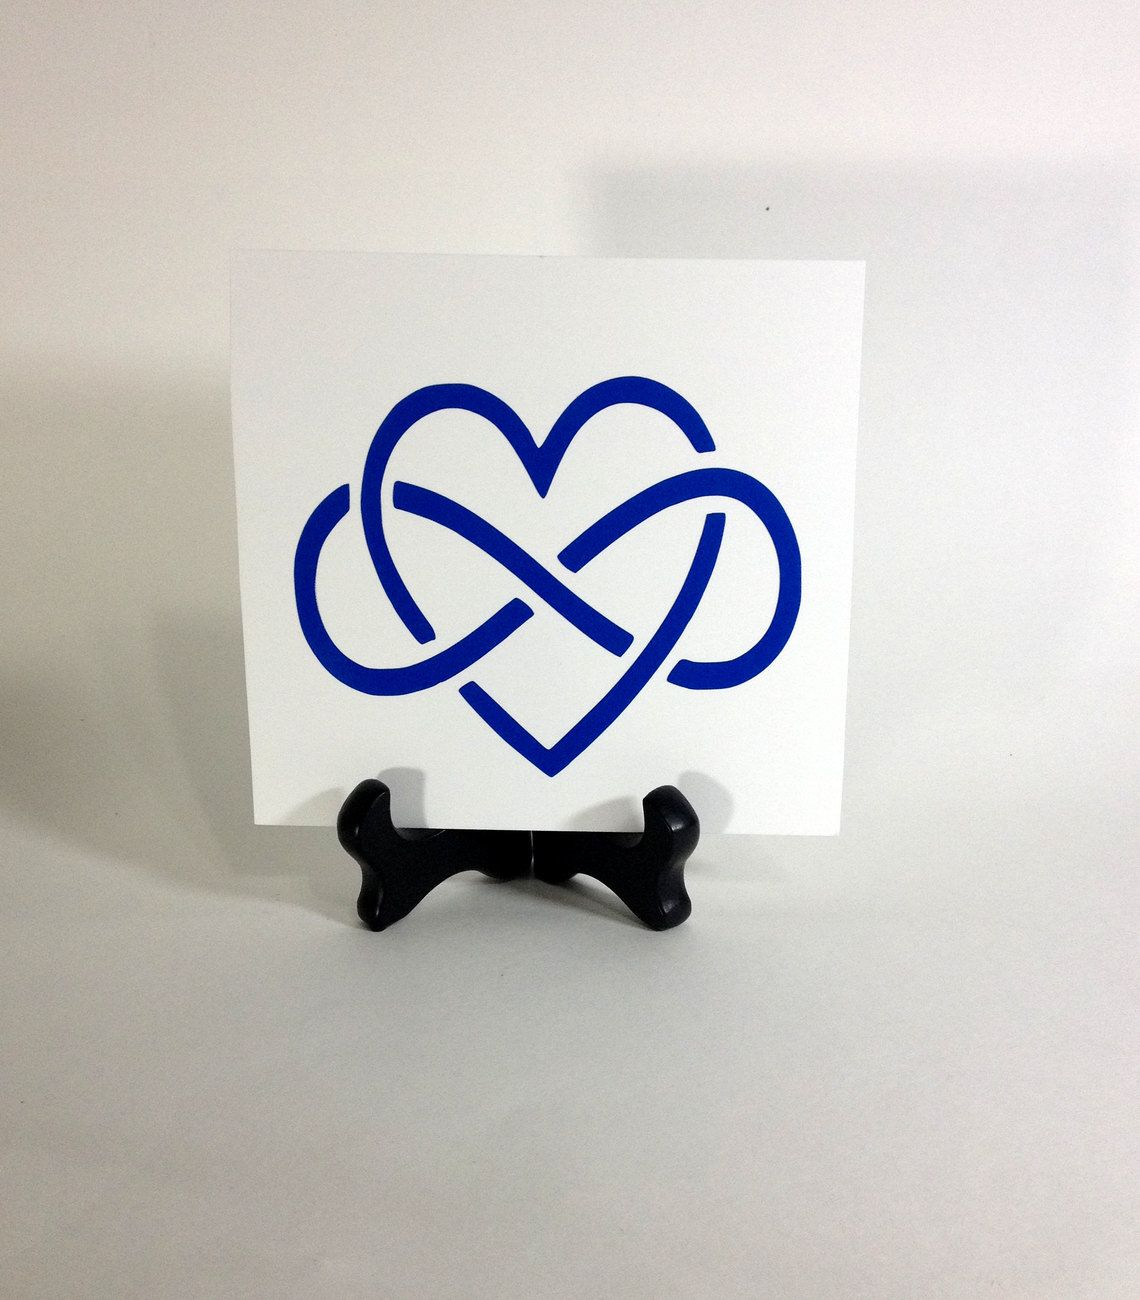 Inifinity heart eternity symbol interlocking by tipperarylane inifinity heart eternity symbol interlocking by tipperarylane biocorpaavc Images